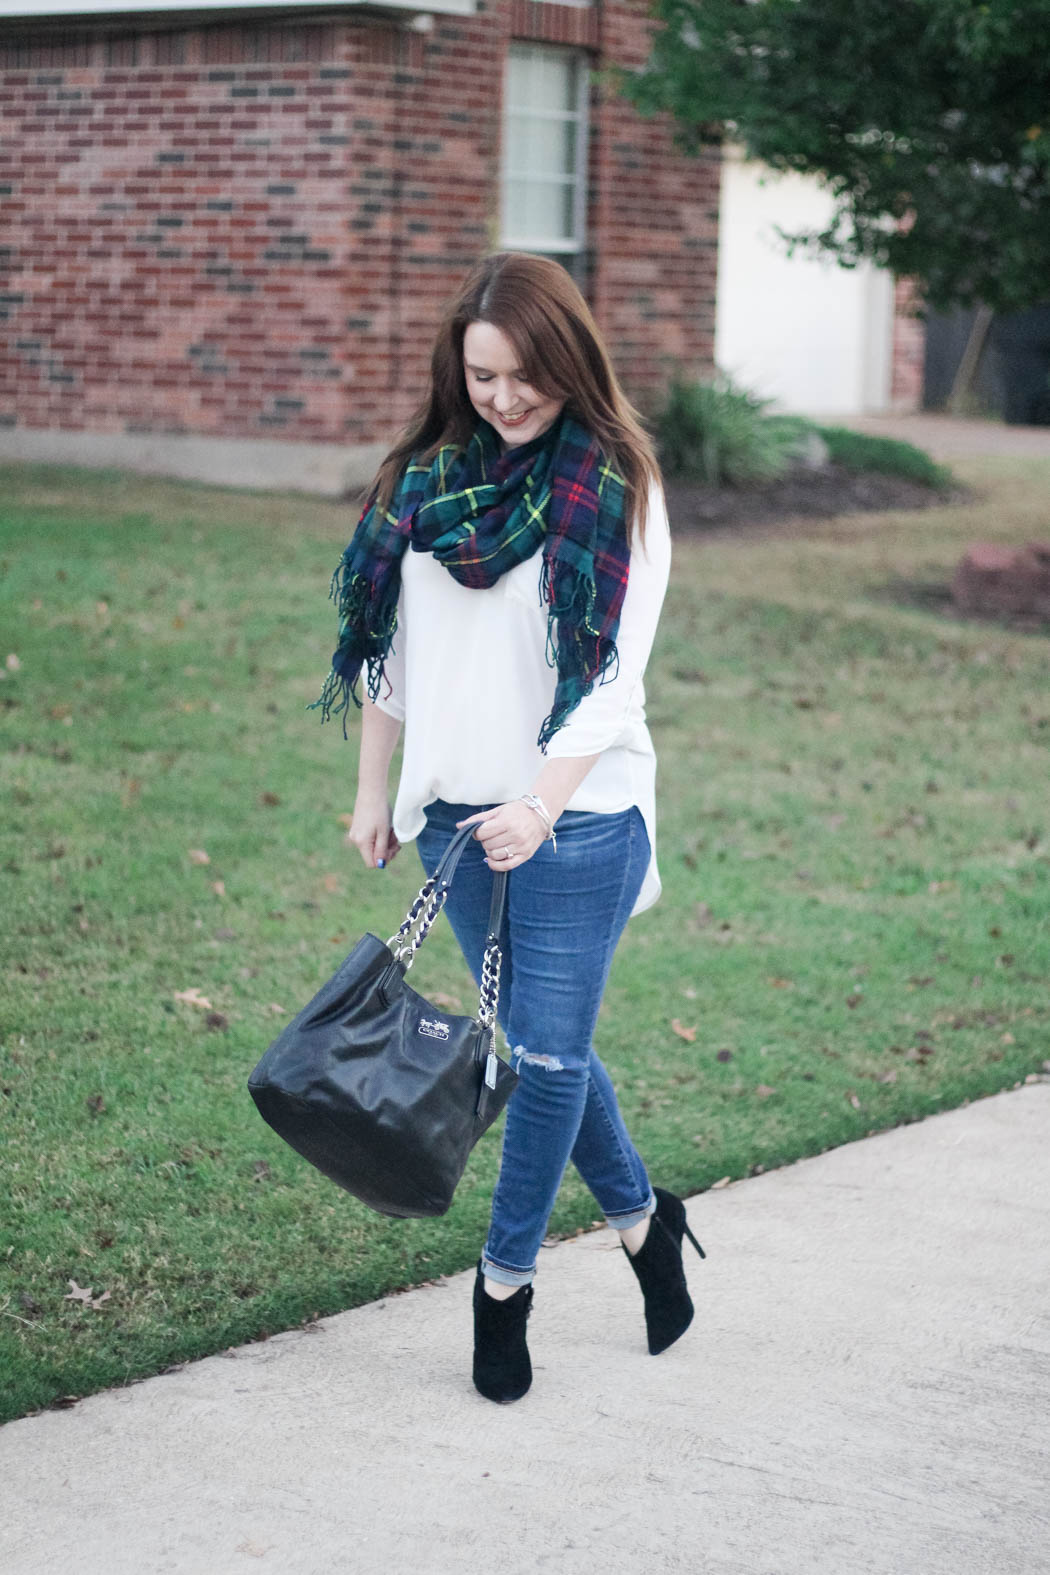 target-scarf-lush-tunic-ag-jeans-coach-bag-charles-david-booties-7